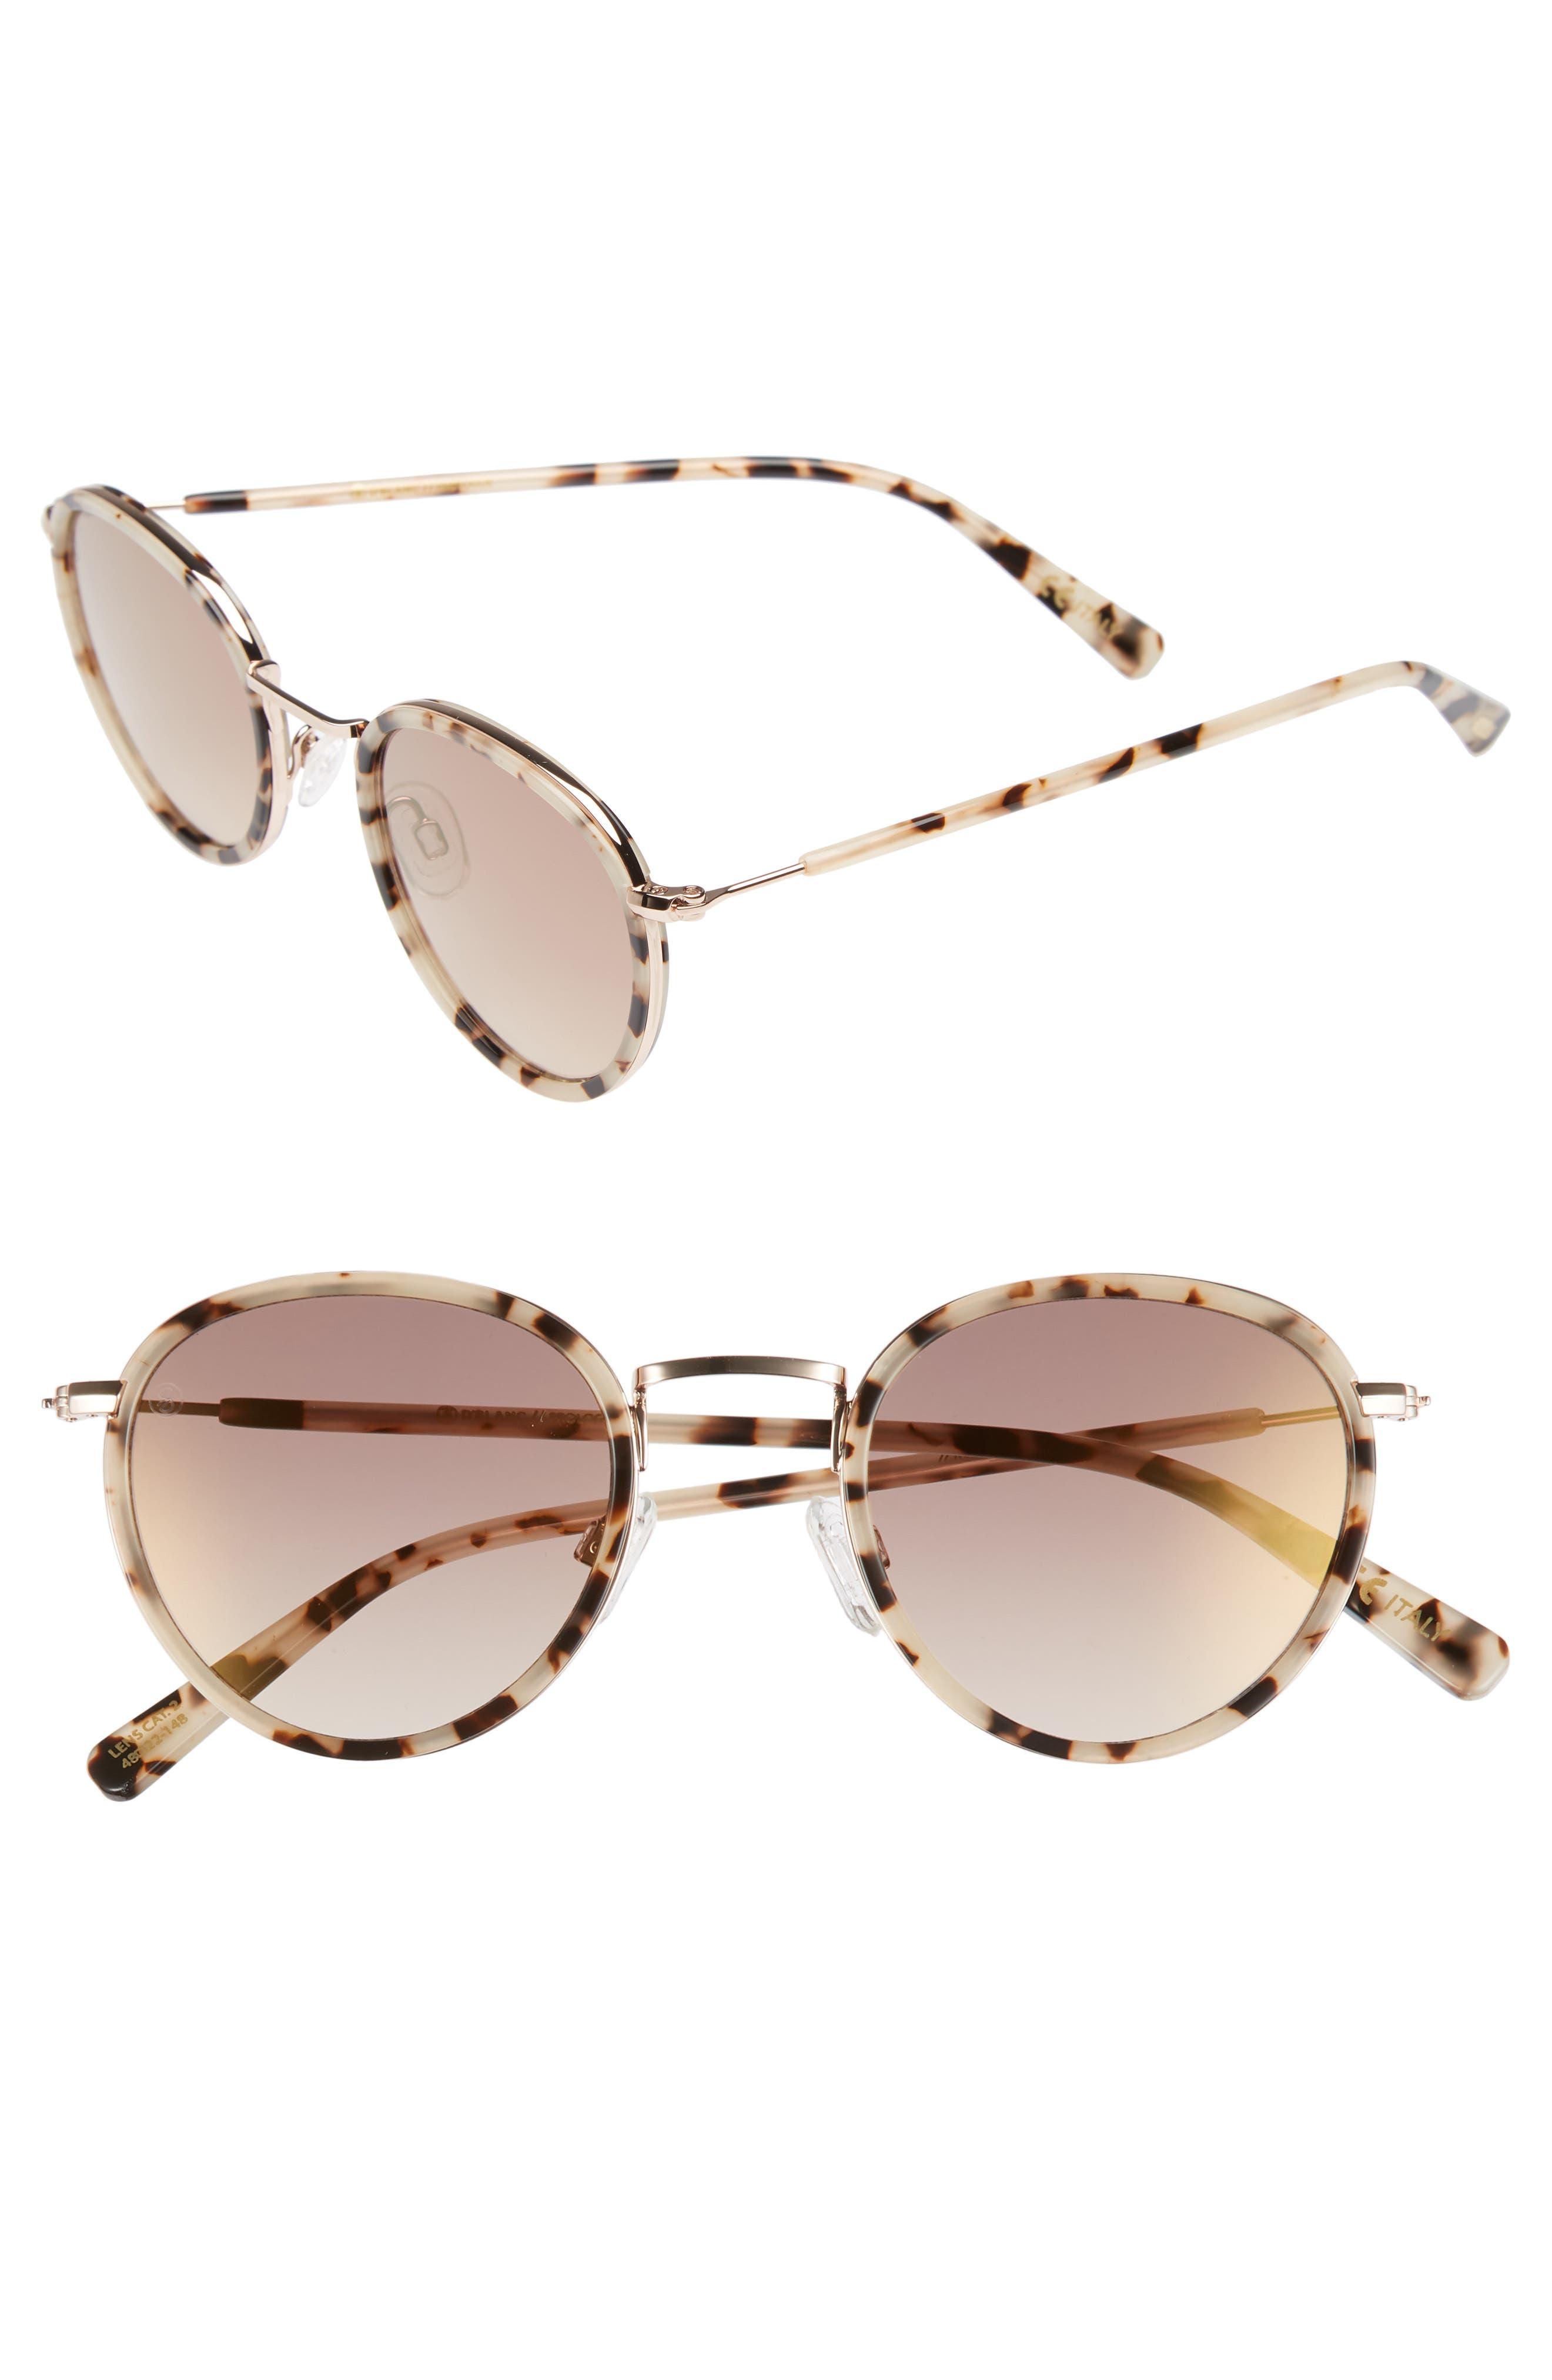 D'BLANC Prologue 48mm Round Sunglasses,                             Main thumbnail 1, color,                             200